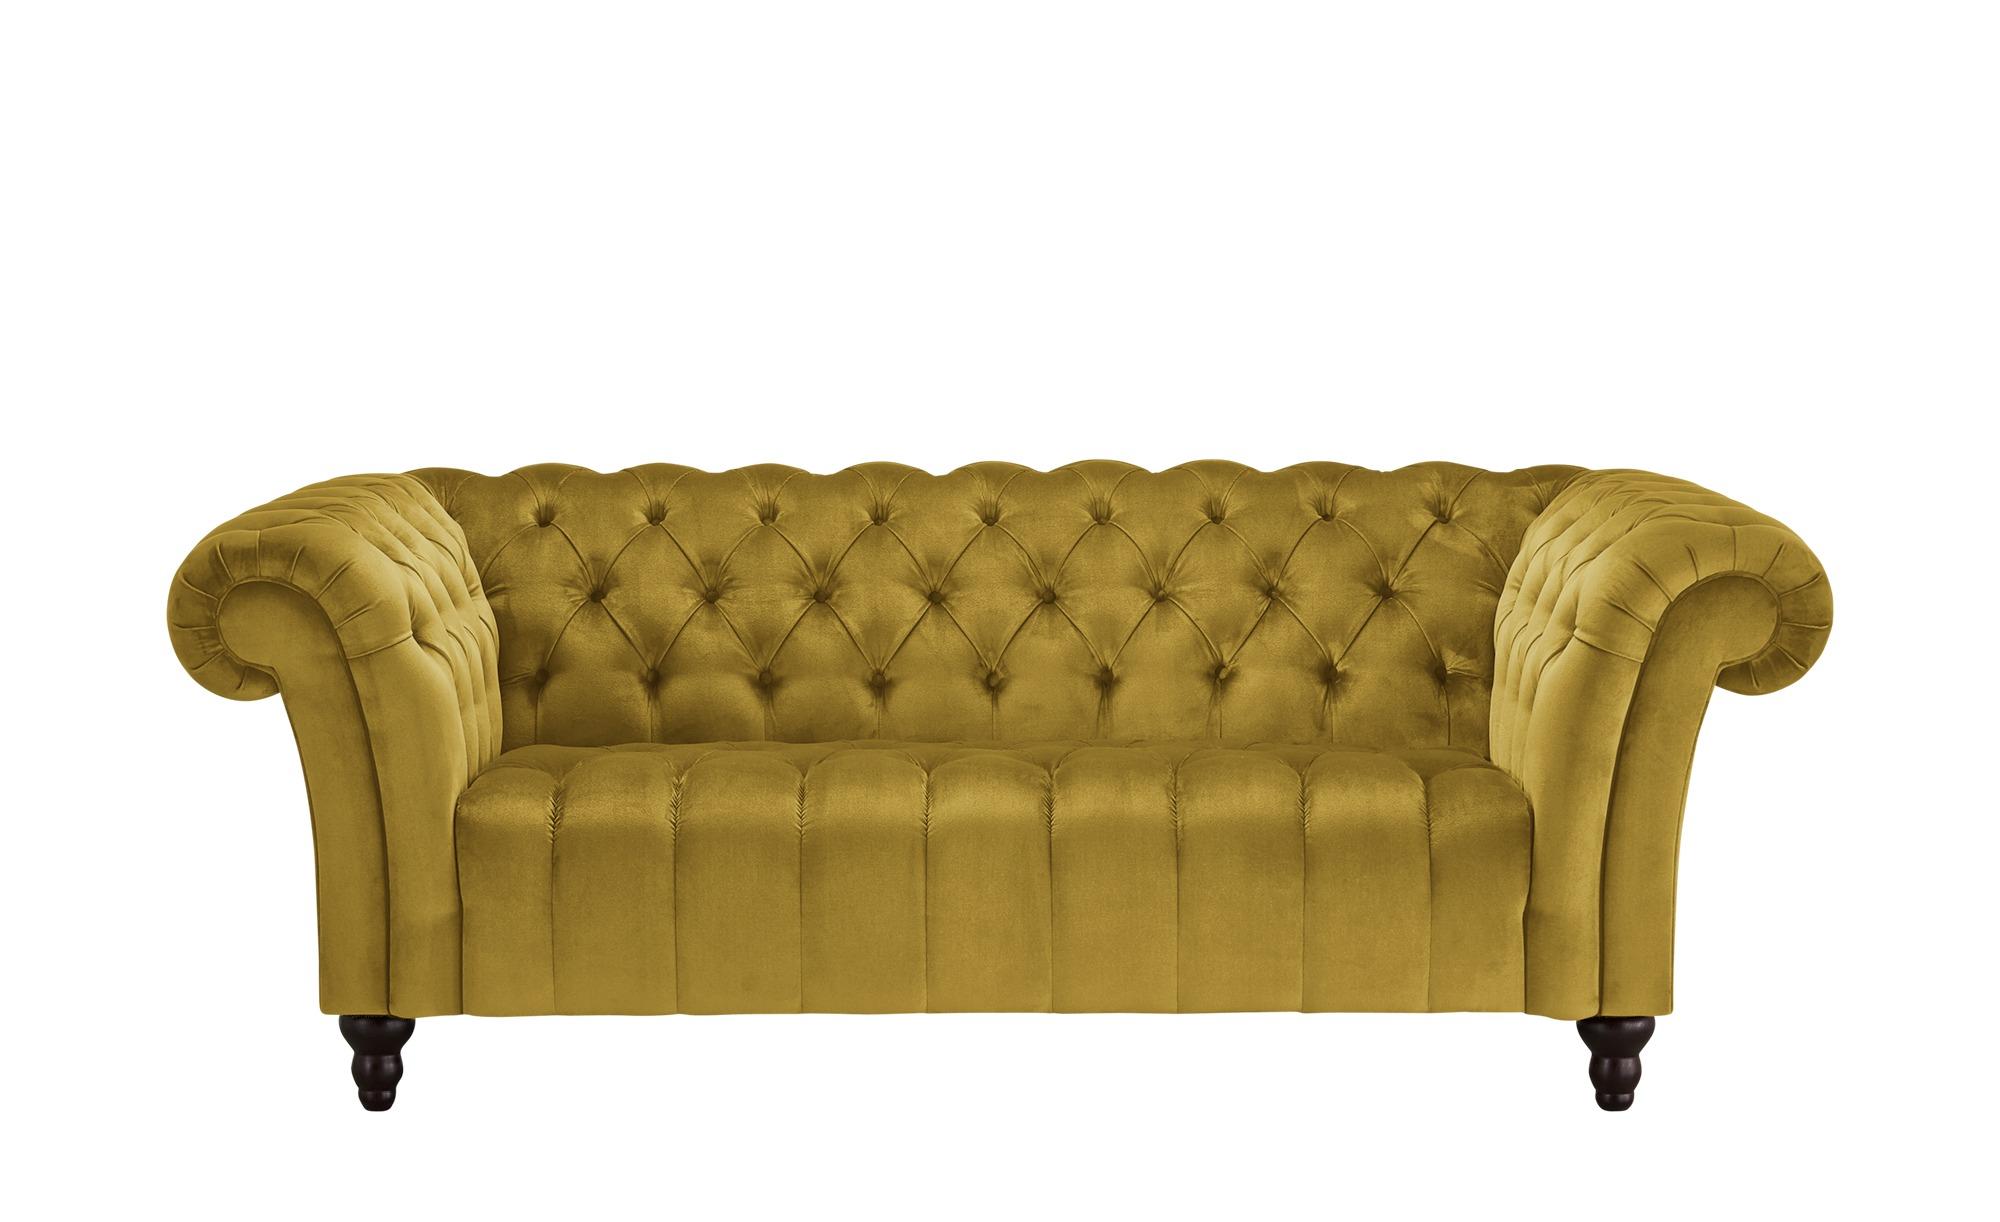 Sofa, 2-sitzig  Canyon ¦ gelb ¦ Maße (cm): B: 205 H: 74 T: 101 Polstermöbel > Sofas > 2-Sitzer - Höffner